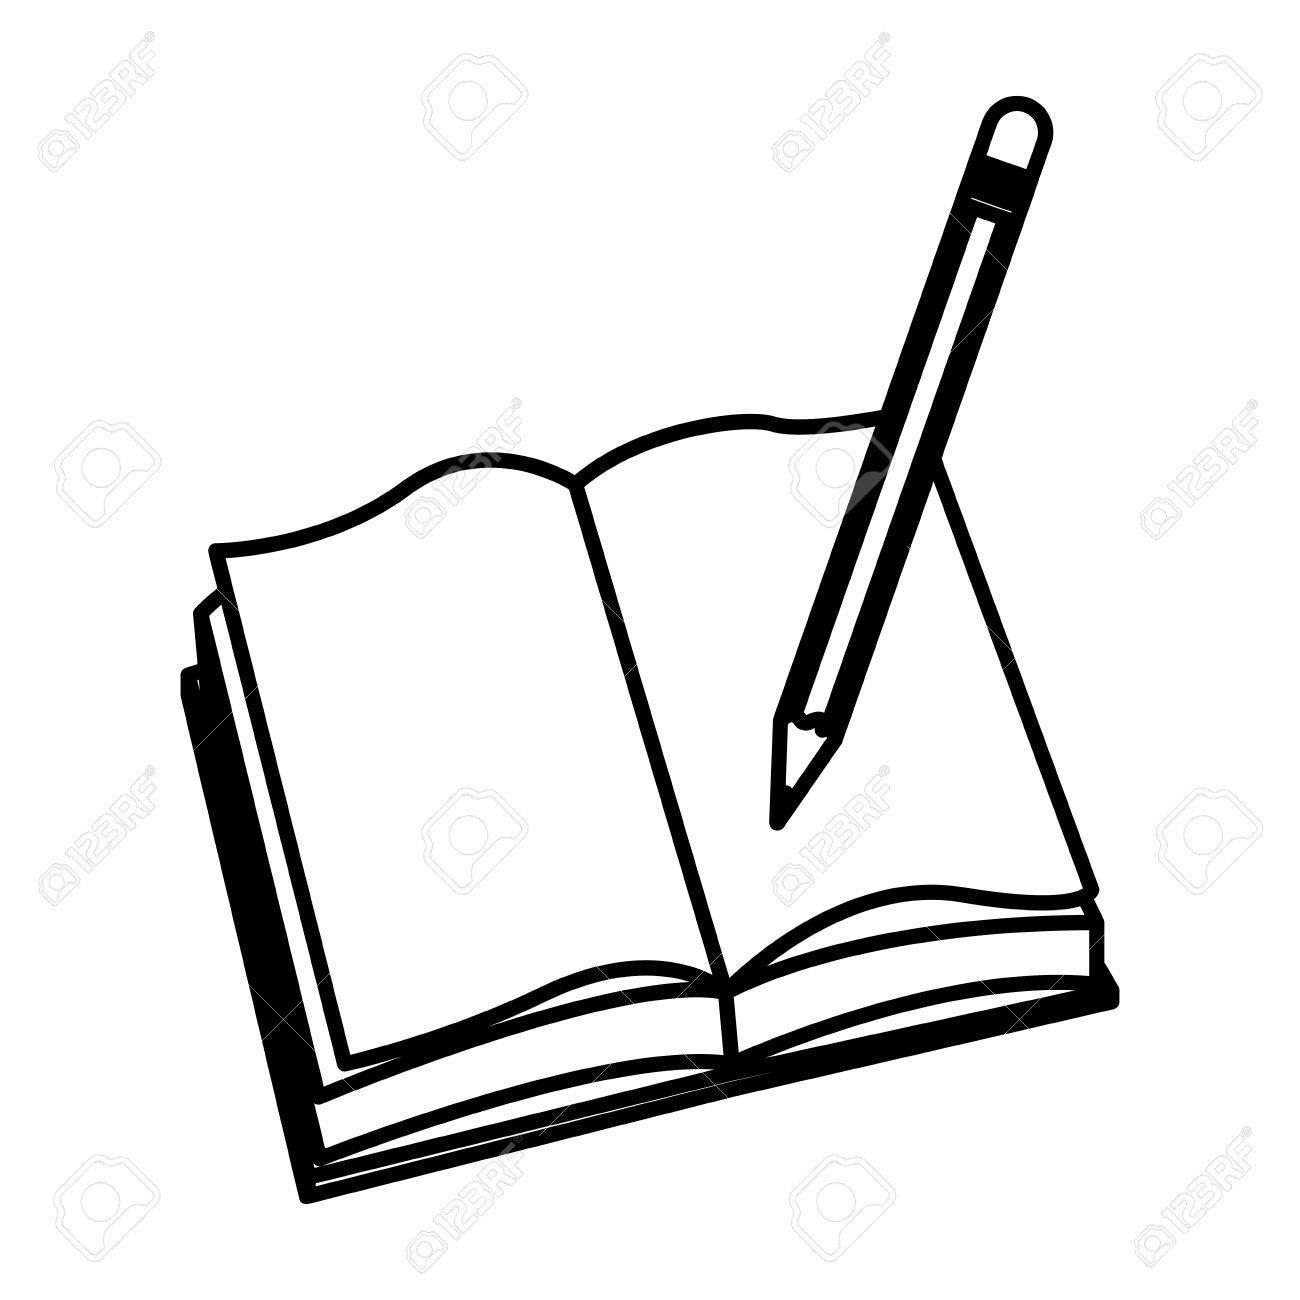 open book pencil write school image vector illustration.